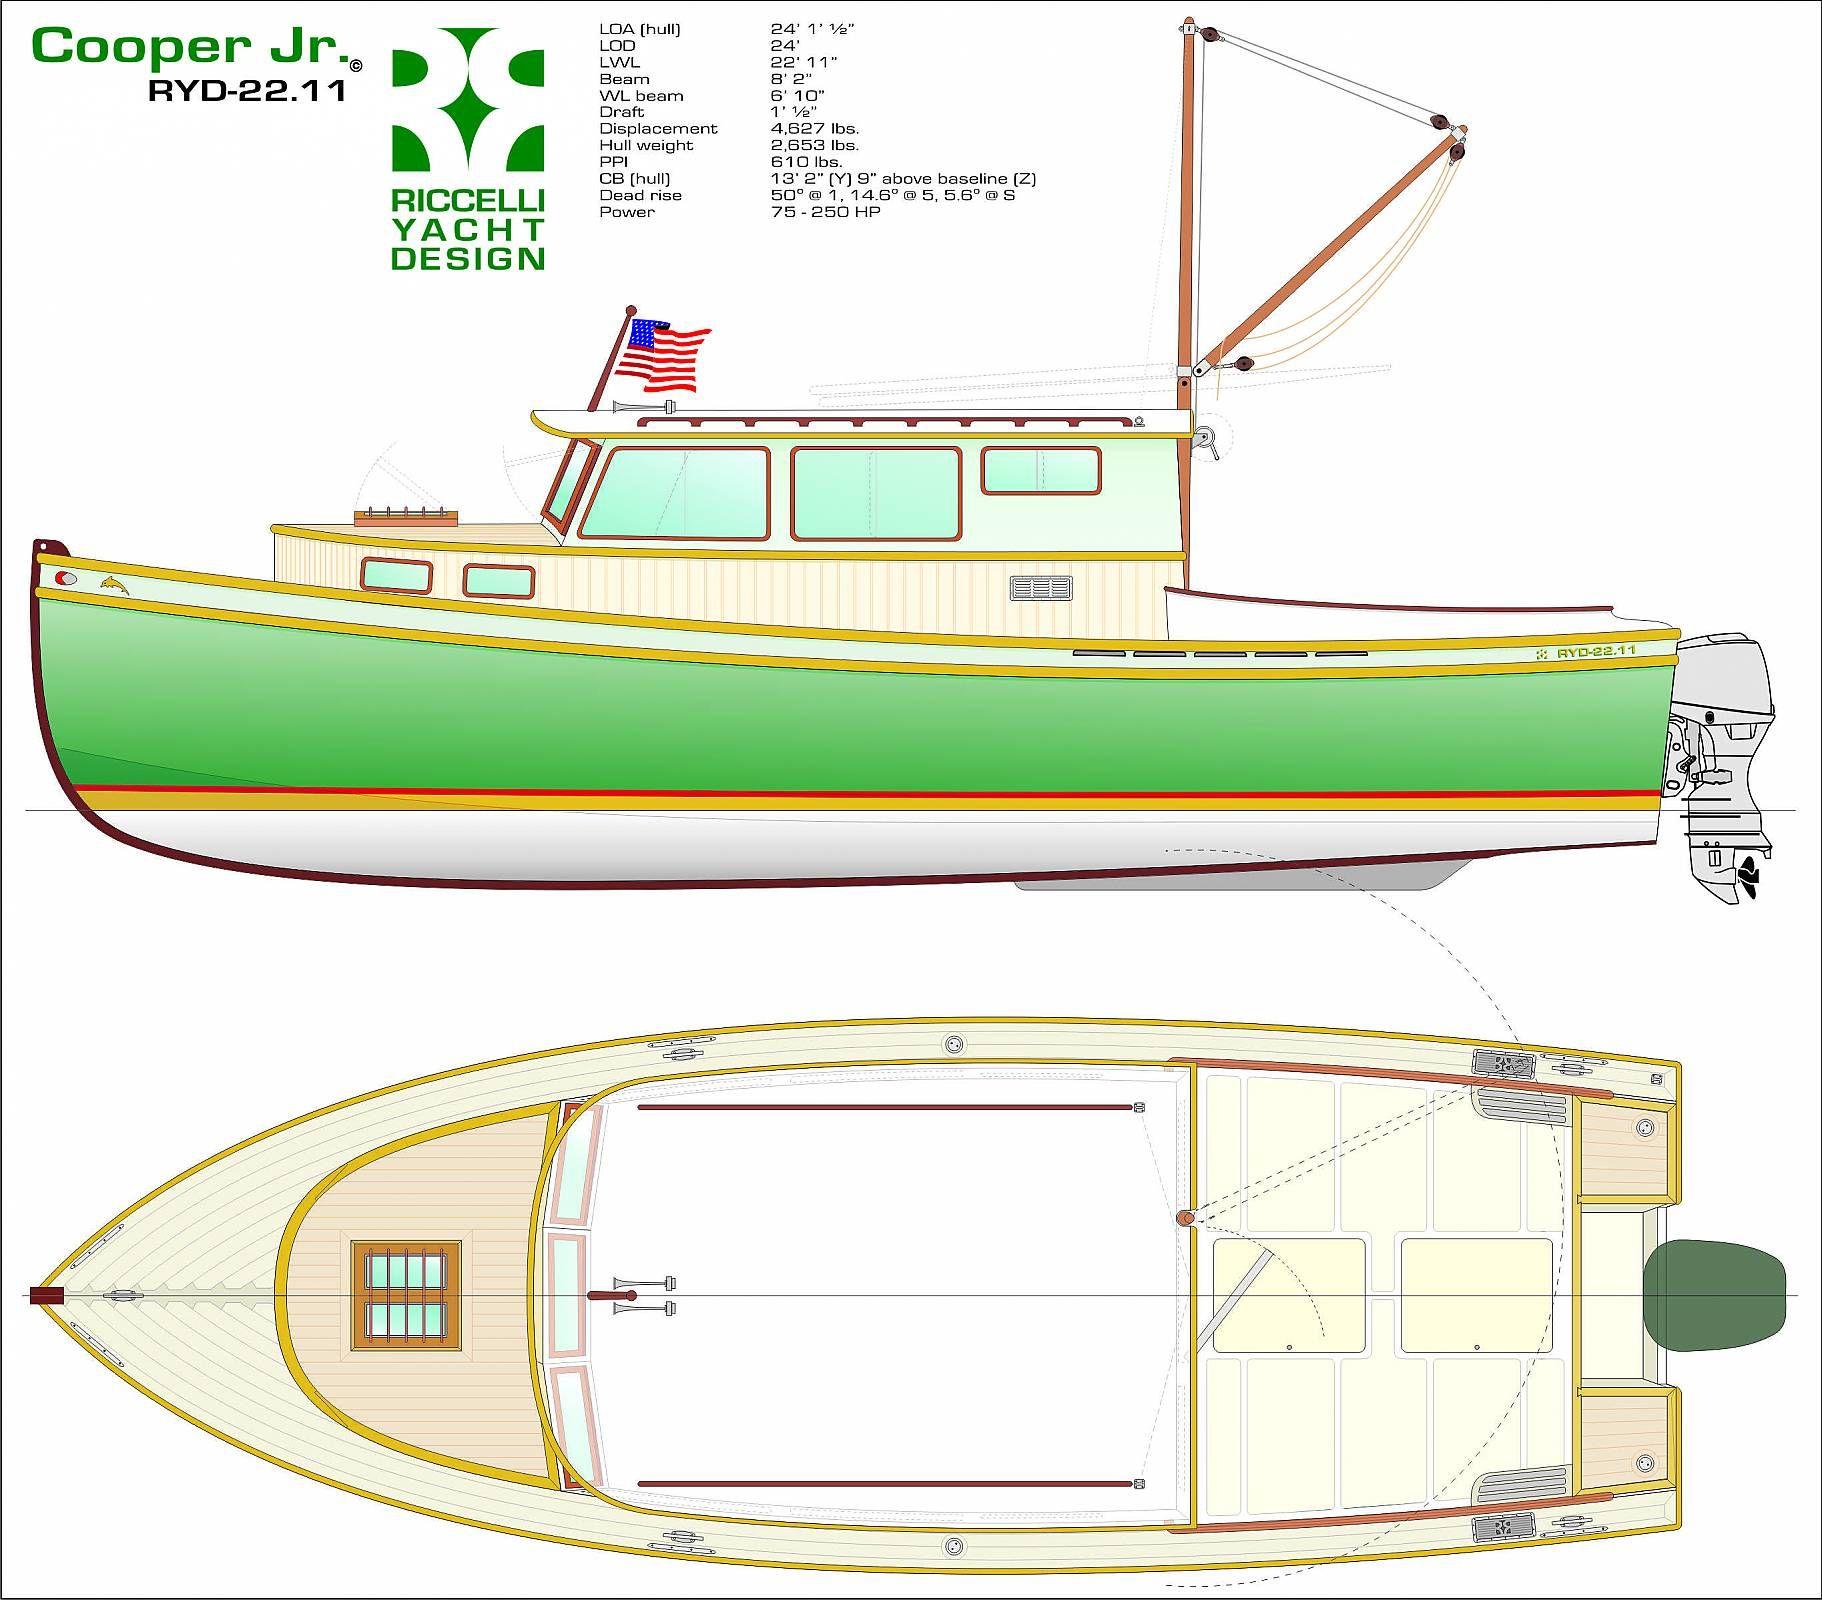 Sport Fishing Boat Plan Boat Plans Boat Building Plans Model Boat Plans